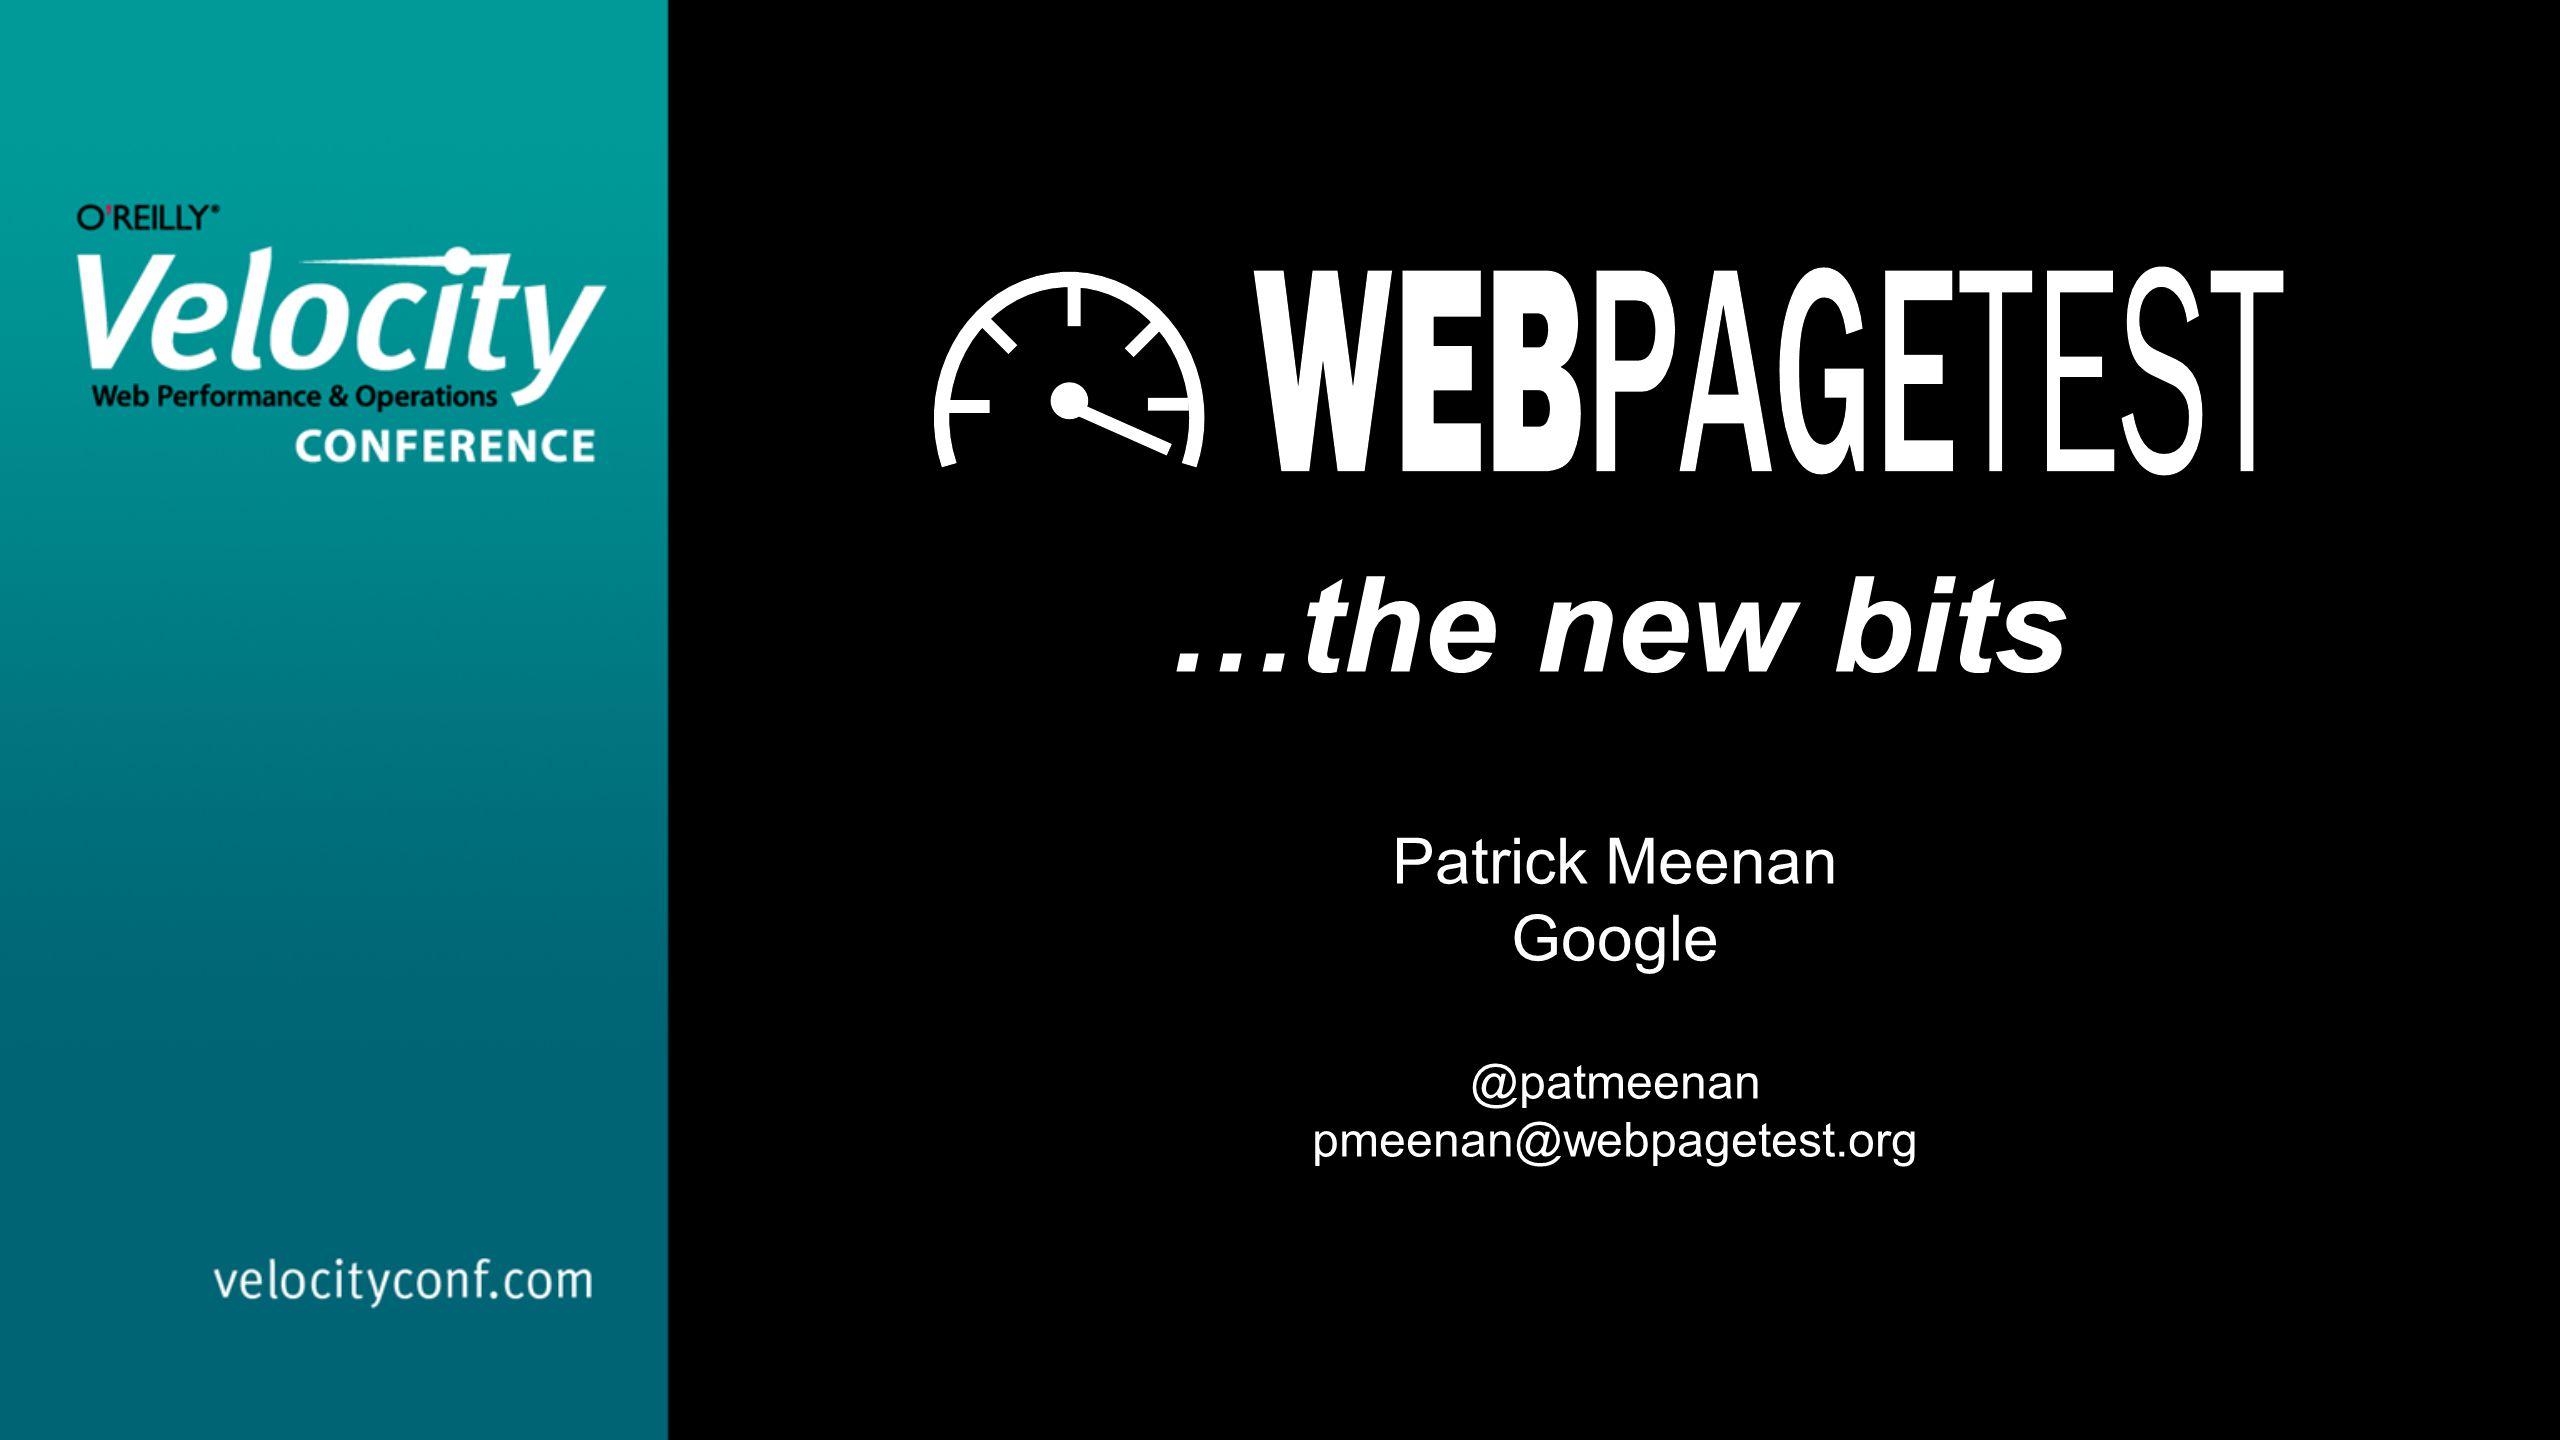 …the new bits Patrick Meenan Google @patmeenan pmeenan@webpagetest.org